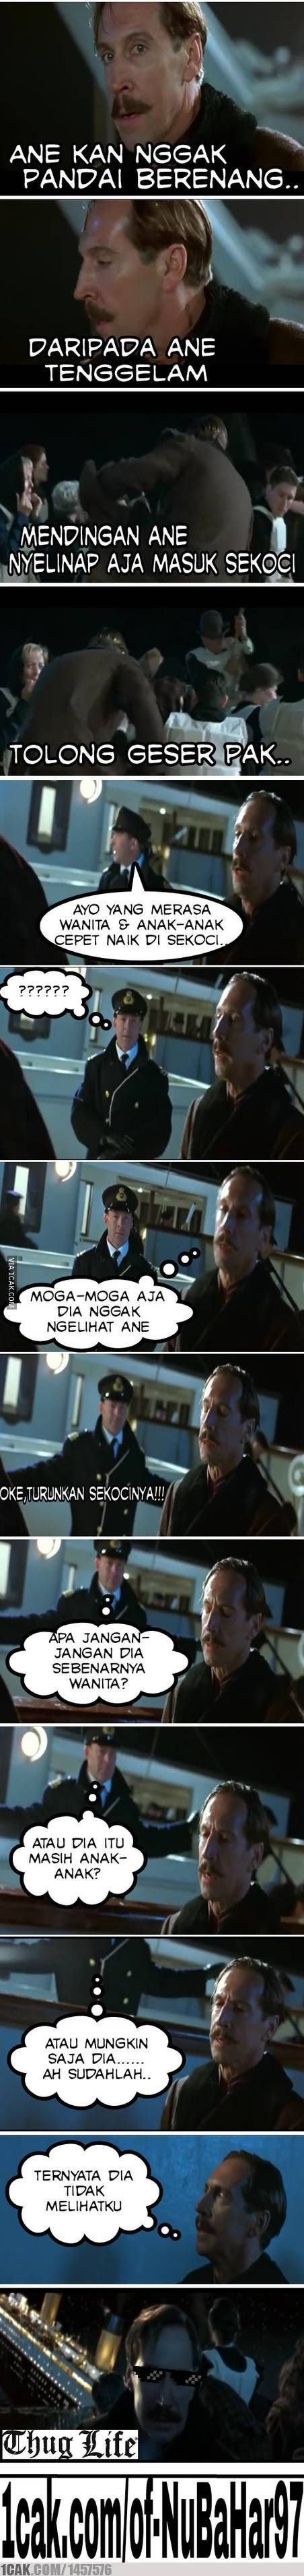 Thug Life Meme Indonesia Lucu V V Pinterest Thug Life And